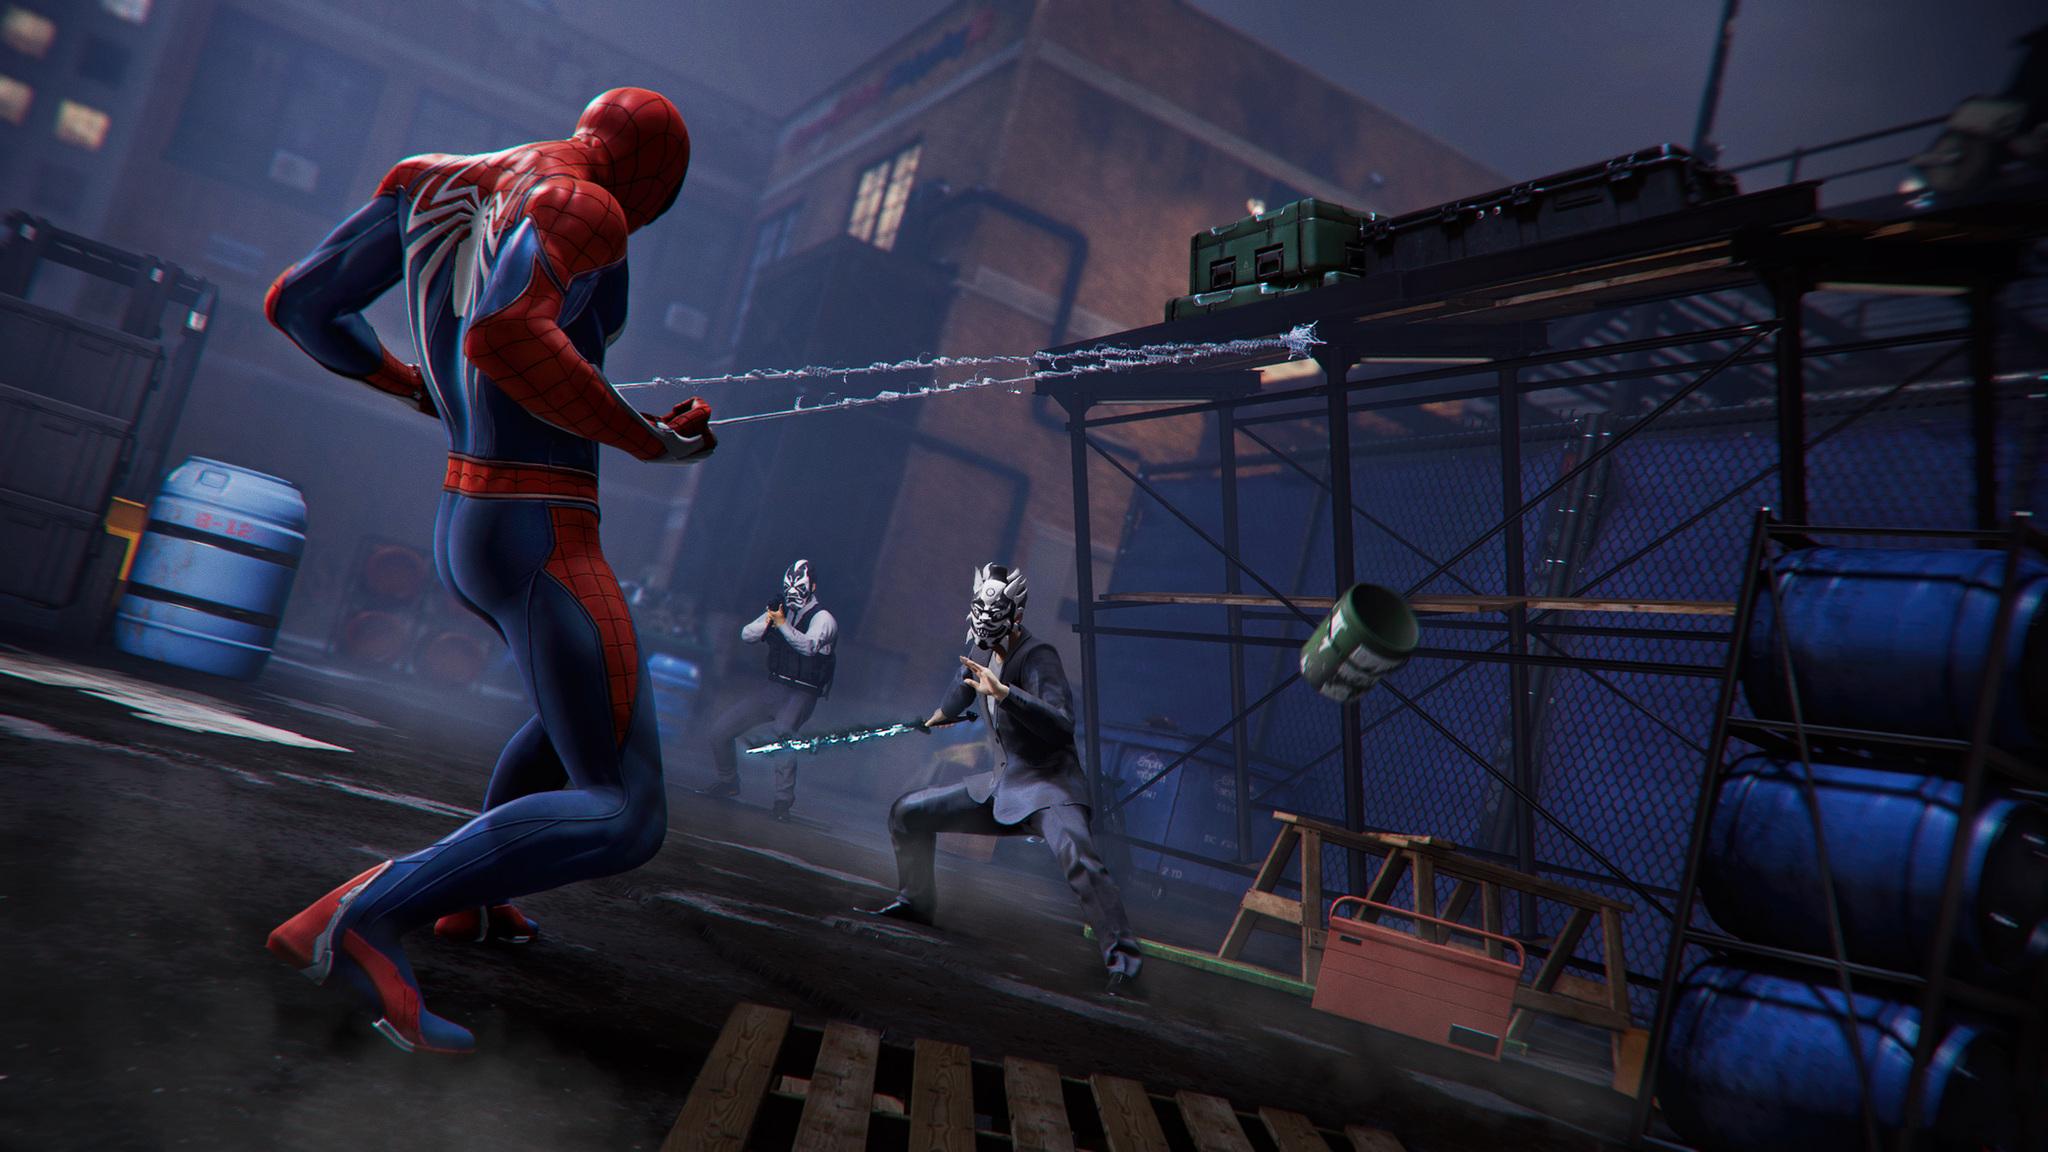 2048x1152 Spiderman Ps4 Pro Gaming 4k 2048x1152 Resolution